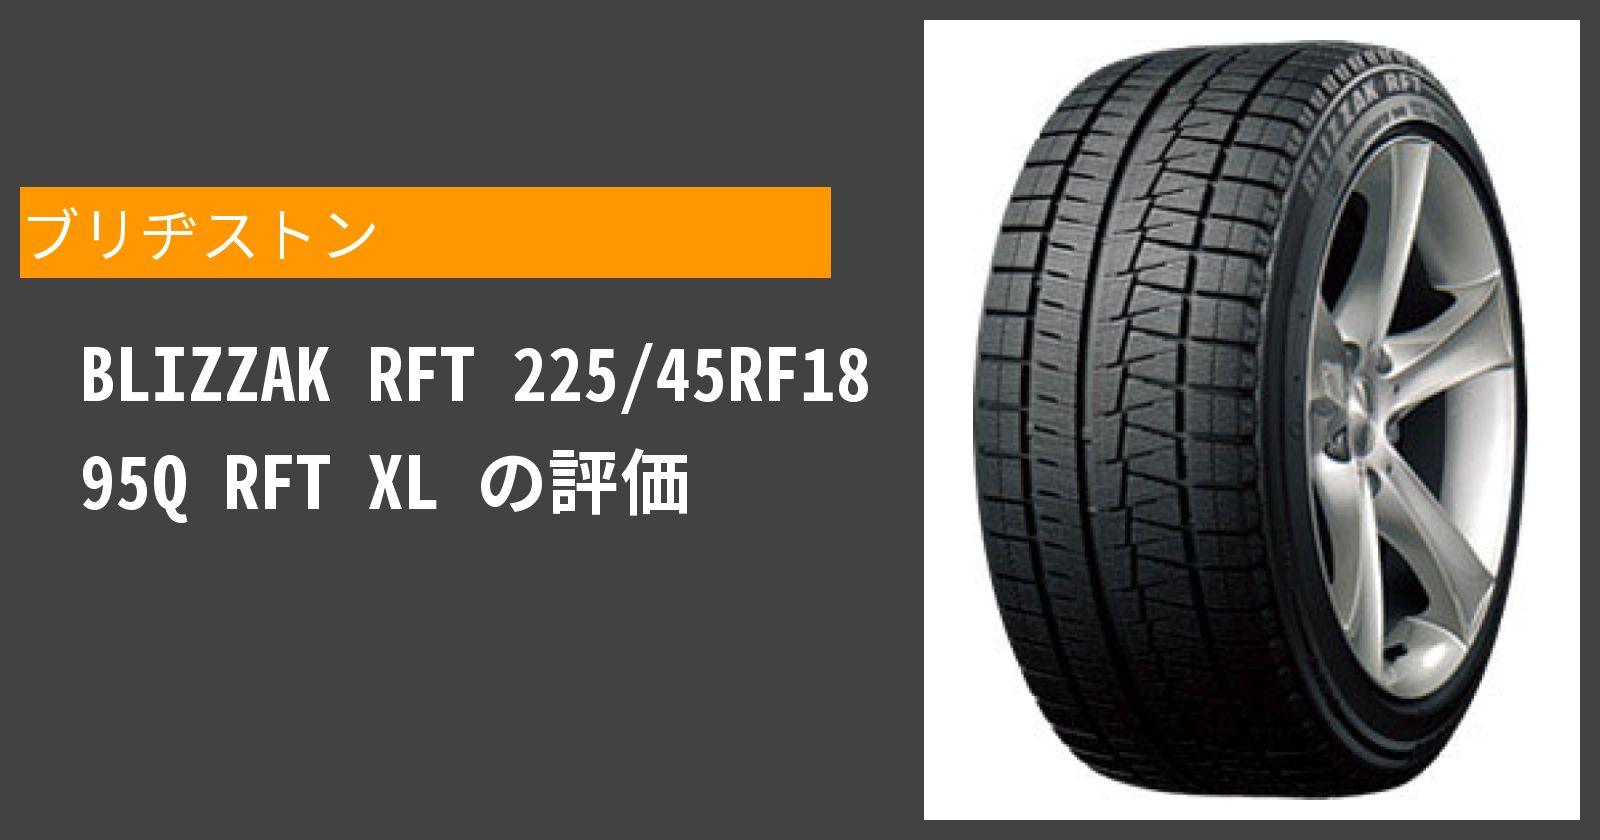 BLIZZAK RFT 225/45RF18 95Q RFT XLを徹底評価